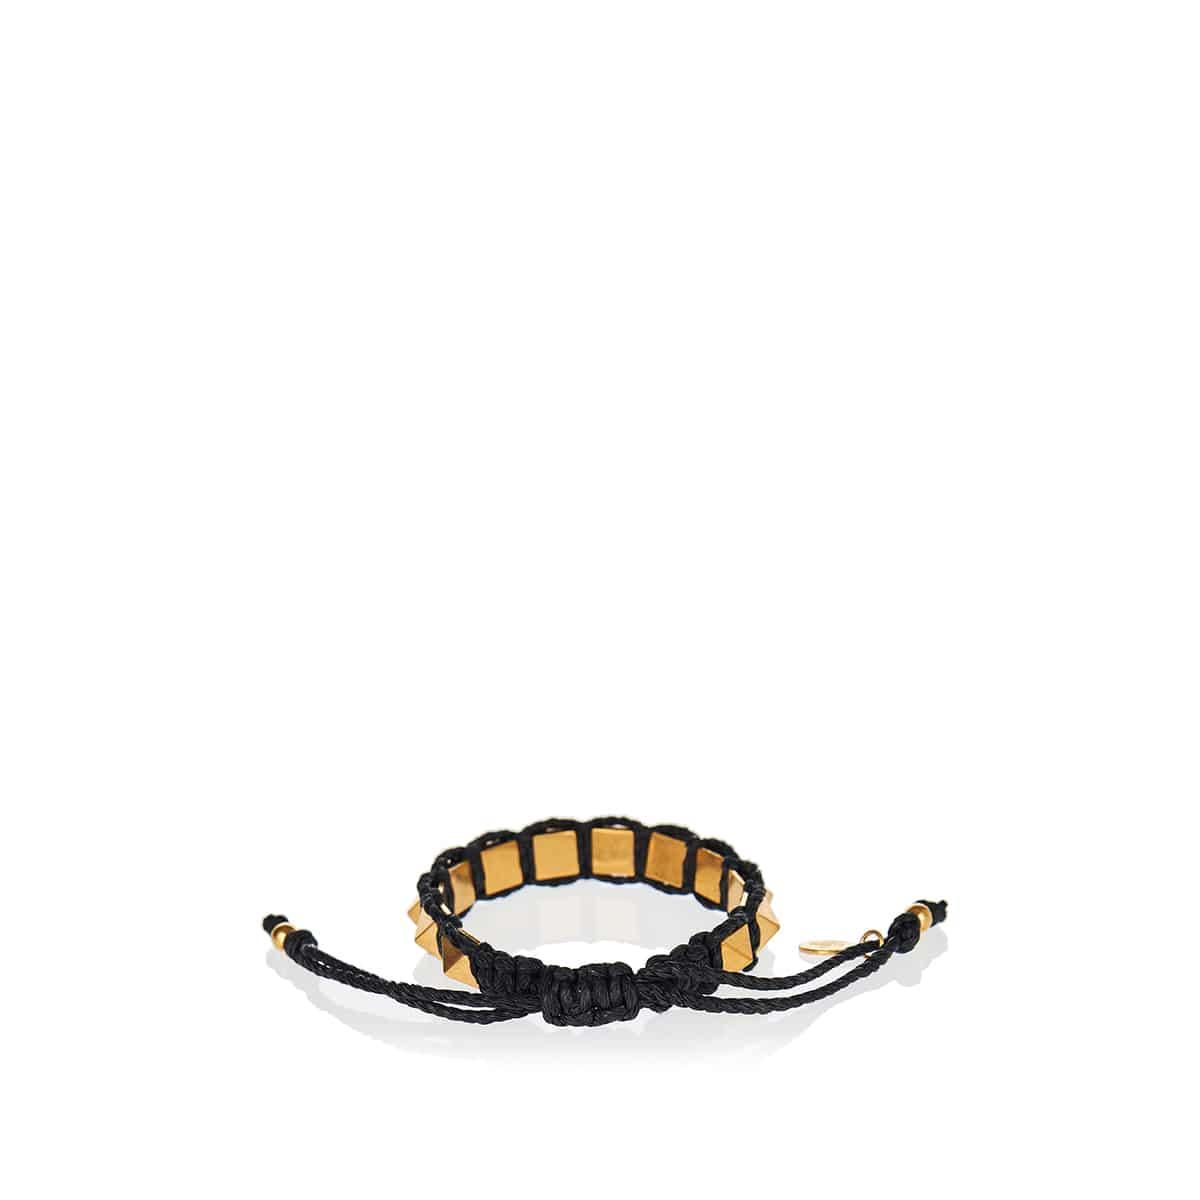 Rockstud macramé bracelet